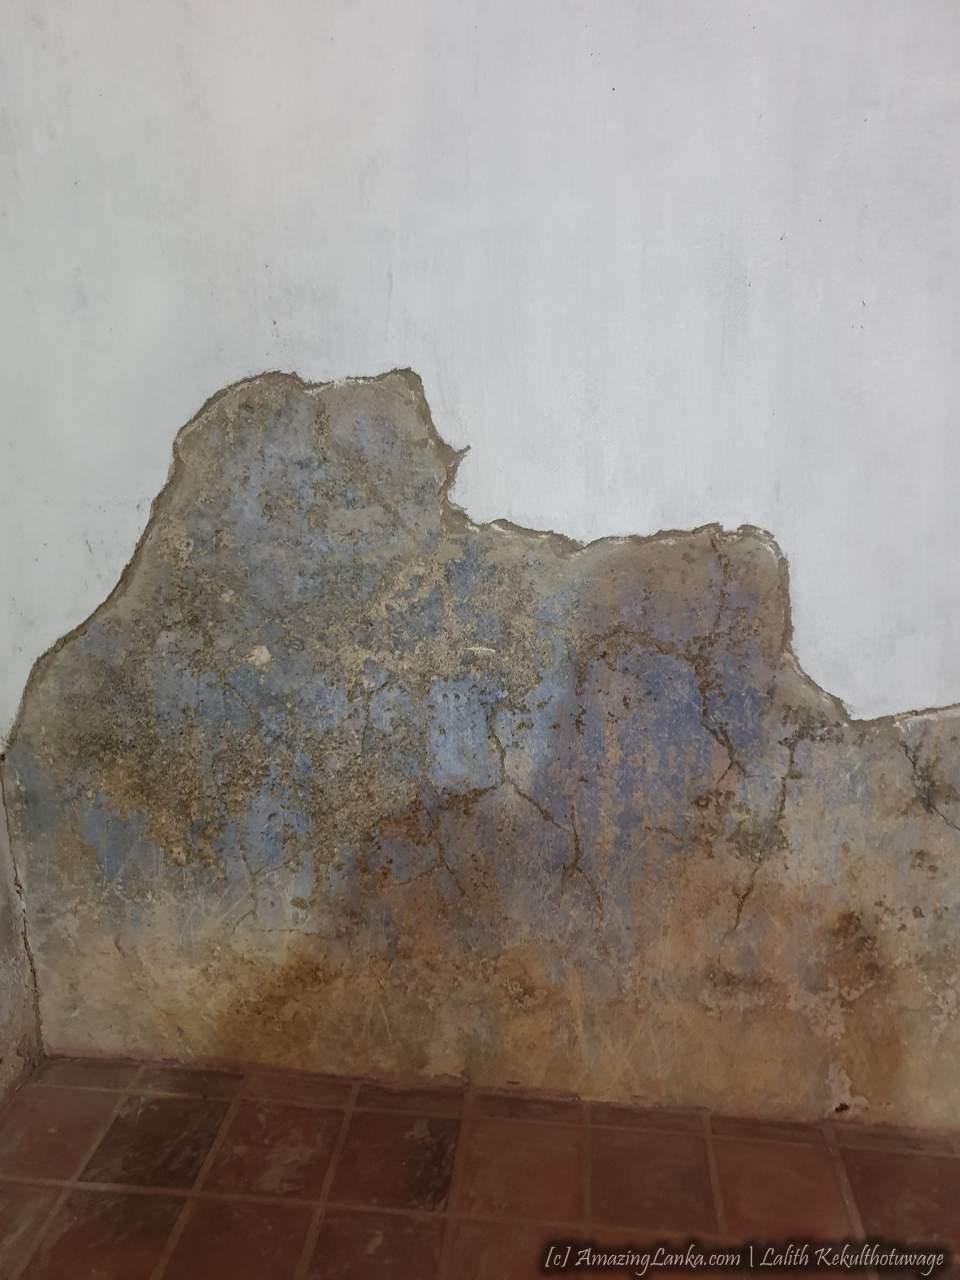 Sri Mudalindarama Purana Viharaya Archaeological Site - කොග්ගල ශ්රී මුදලින්දාරාම පුරාණ විහාරය පුරාවිද්යා භූමිය